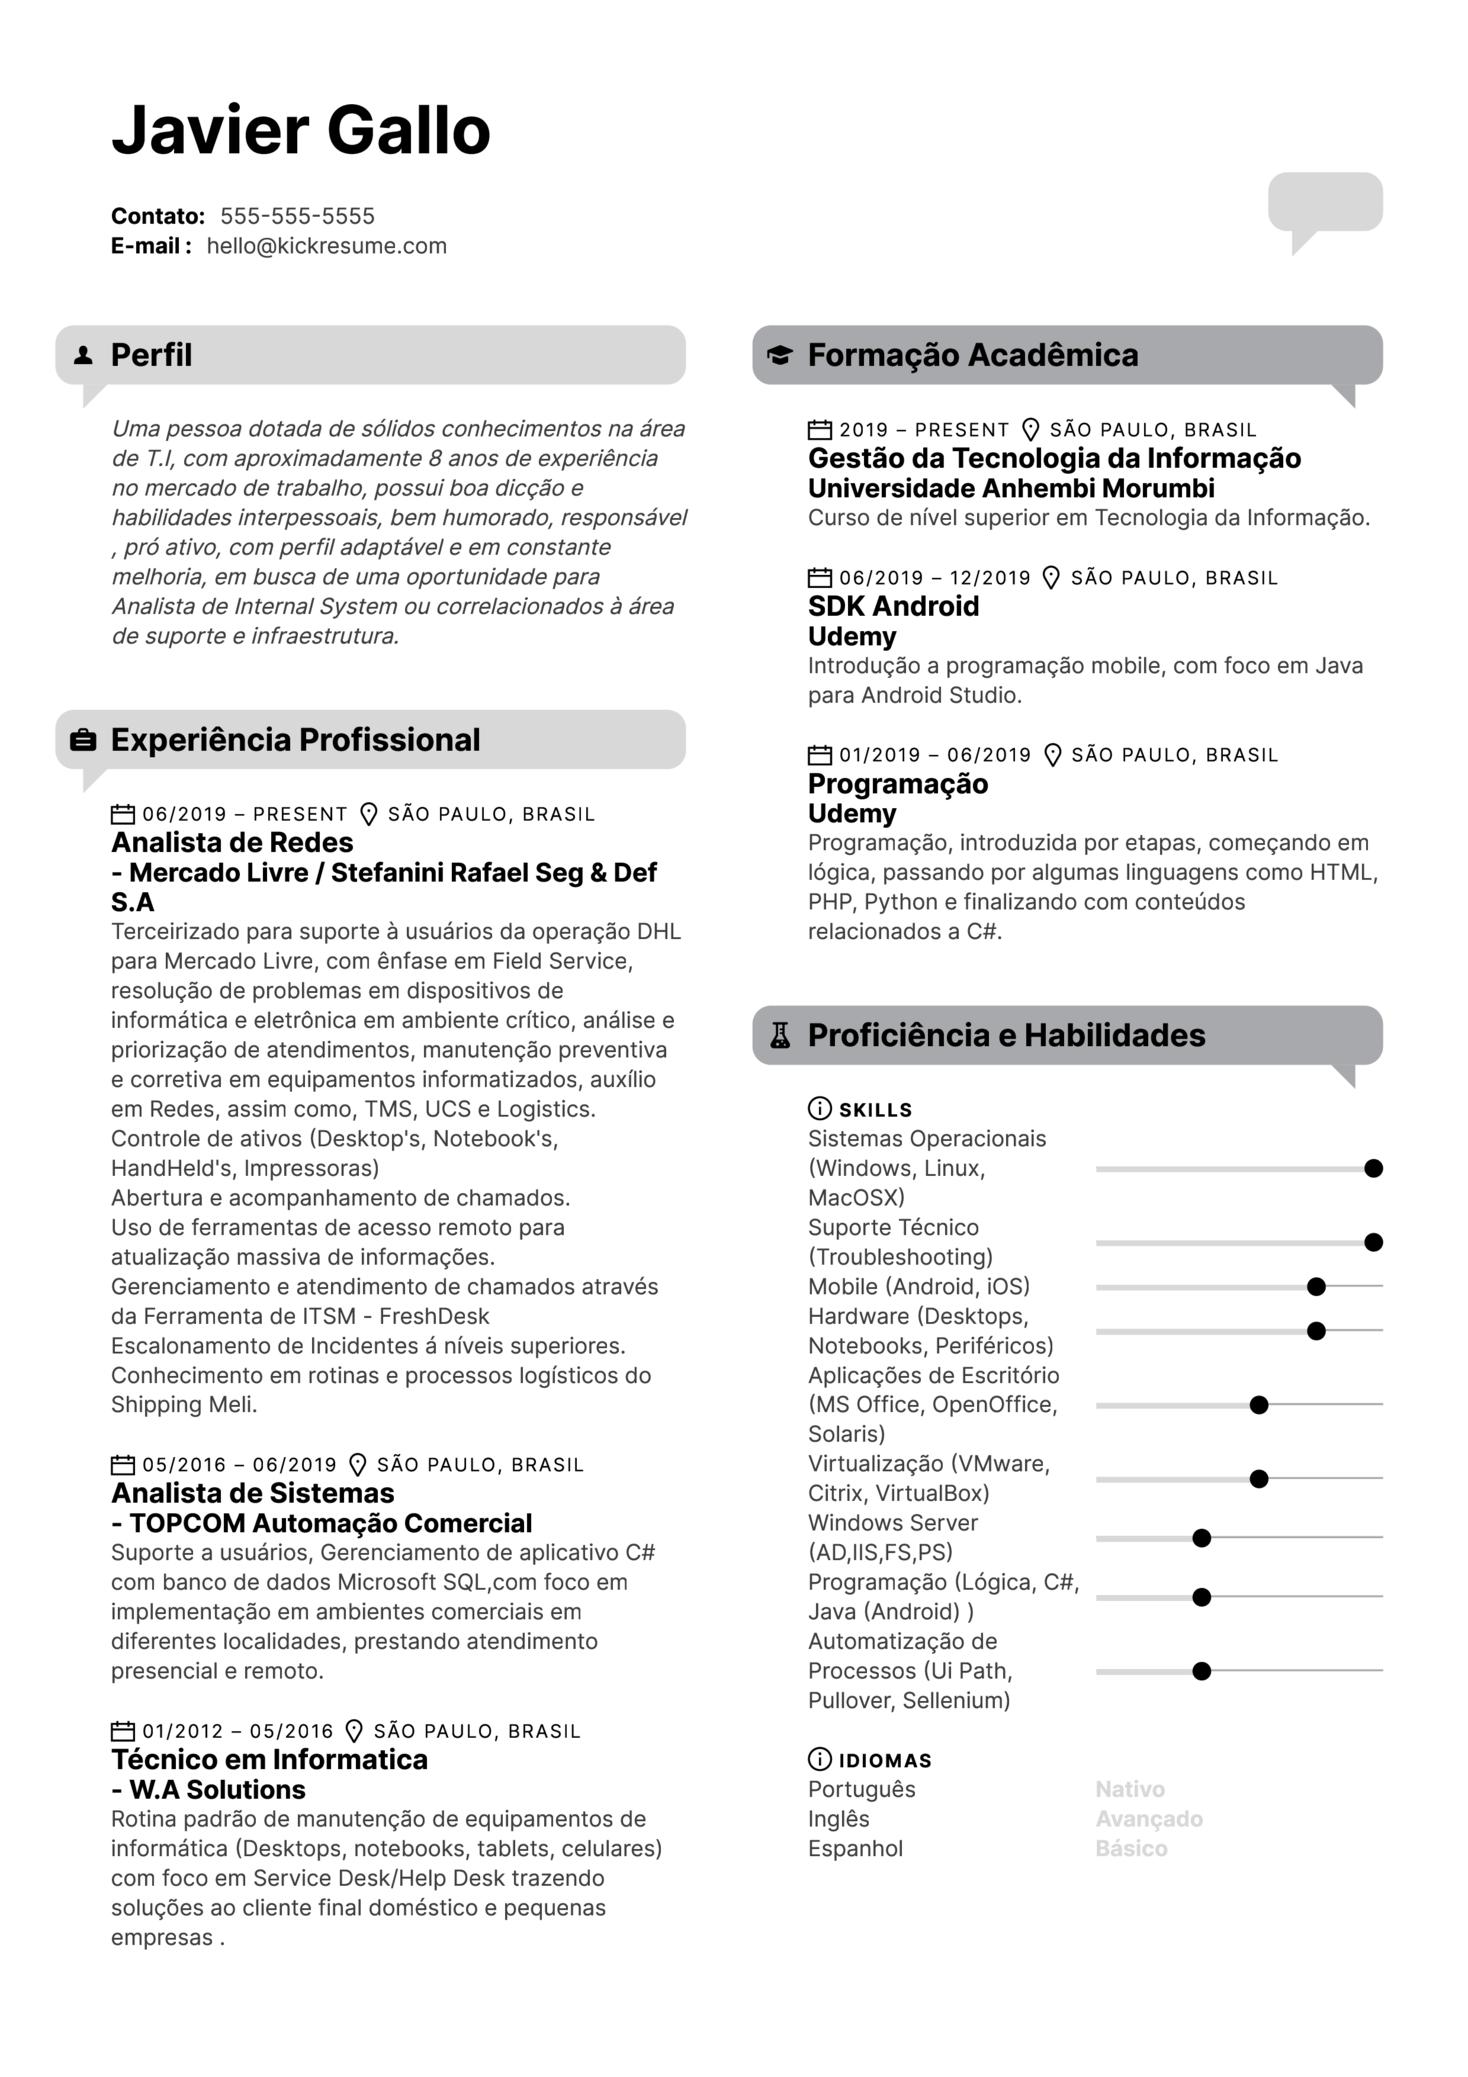 MercadoLibre Network Analyst Resume Example [ES]